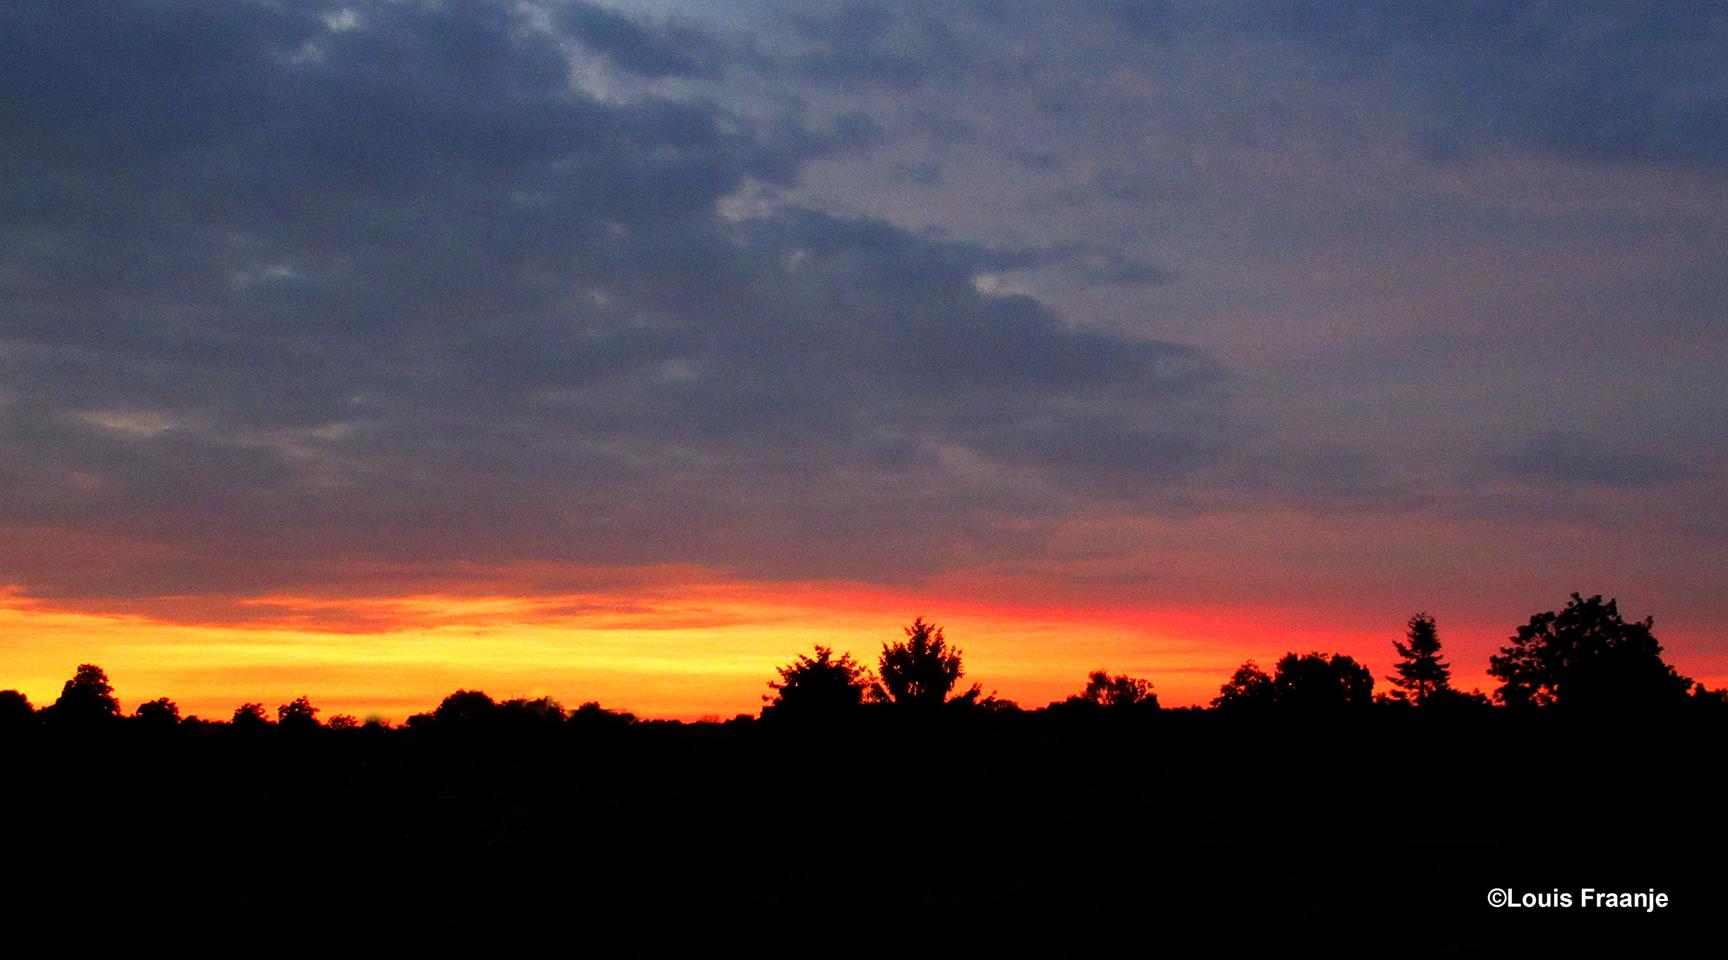 Onderaan de donkere avondlucht, kleurde vanavond de hemel vlammend rood - Foto: ©Louis Fraanje